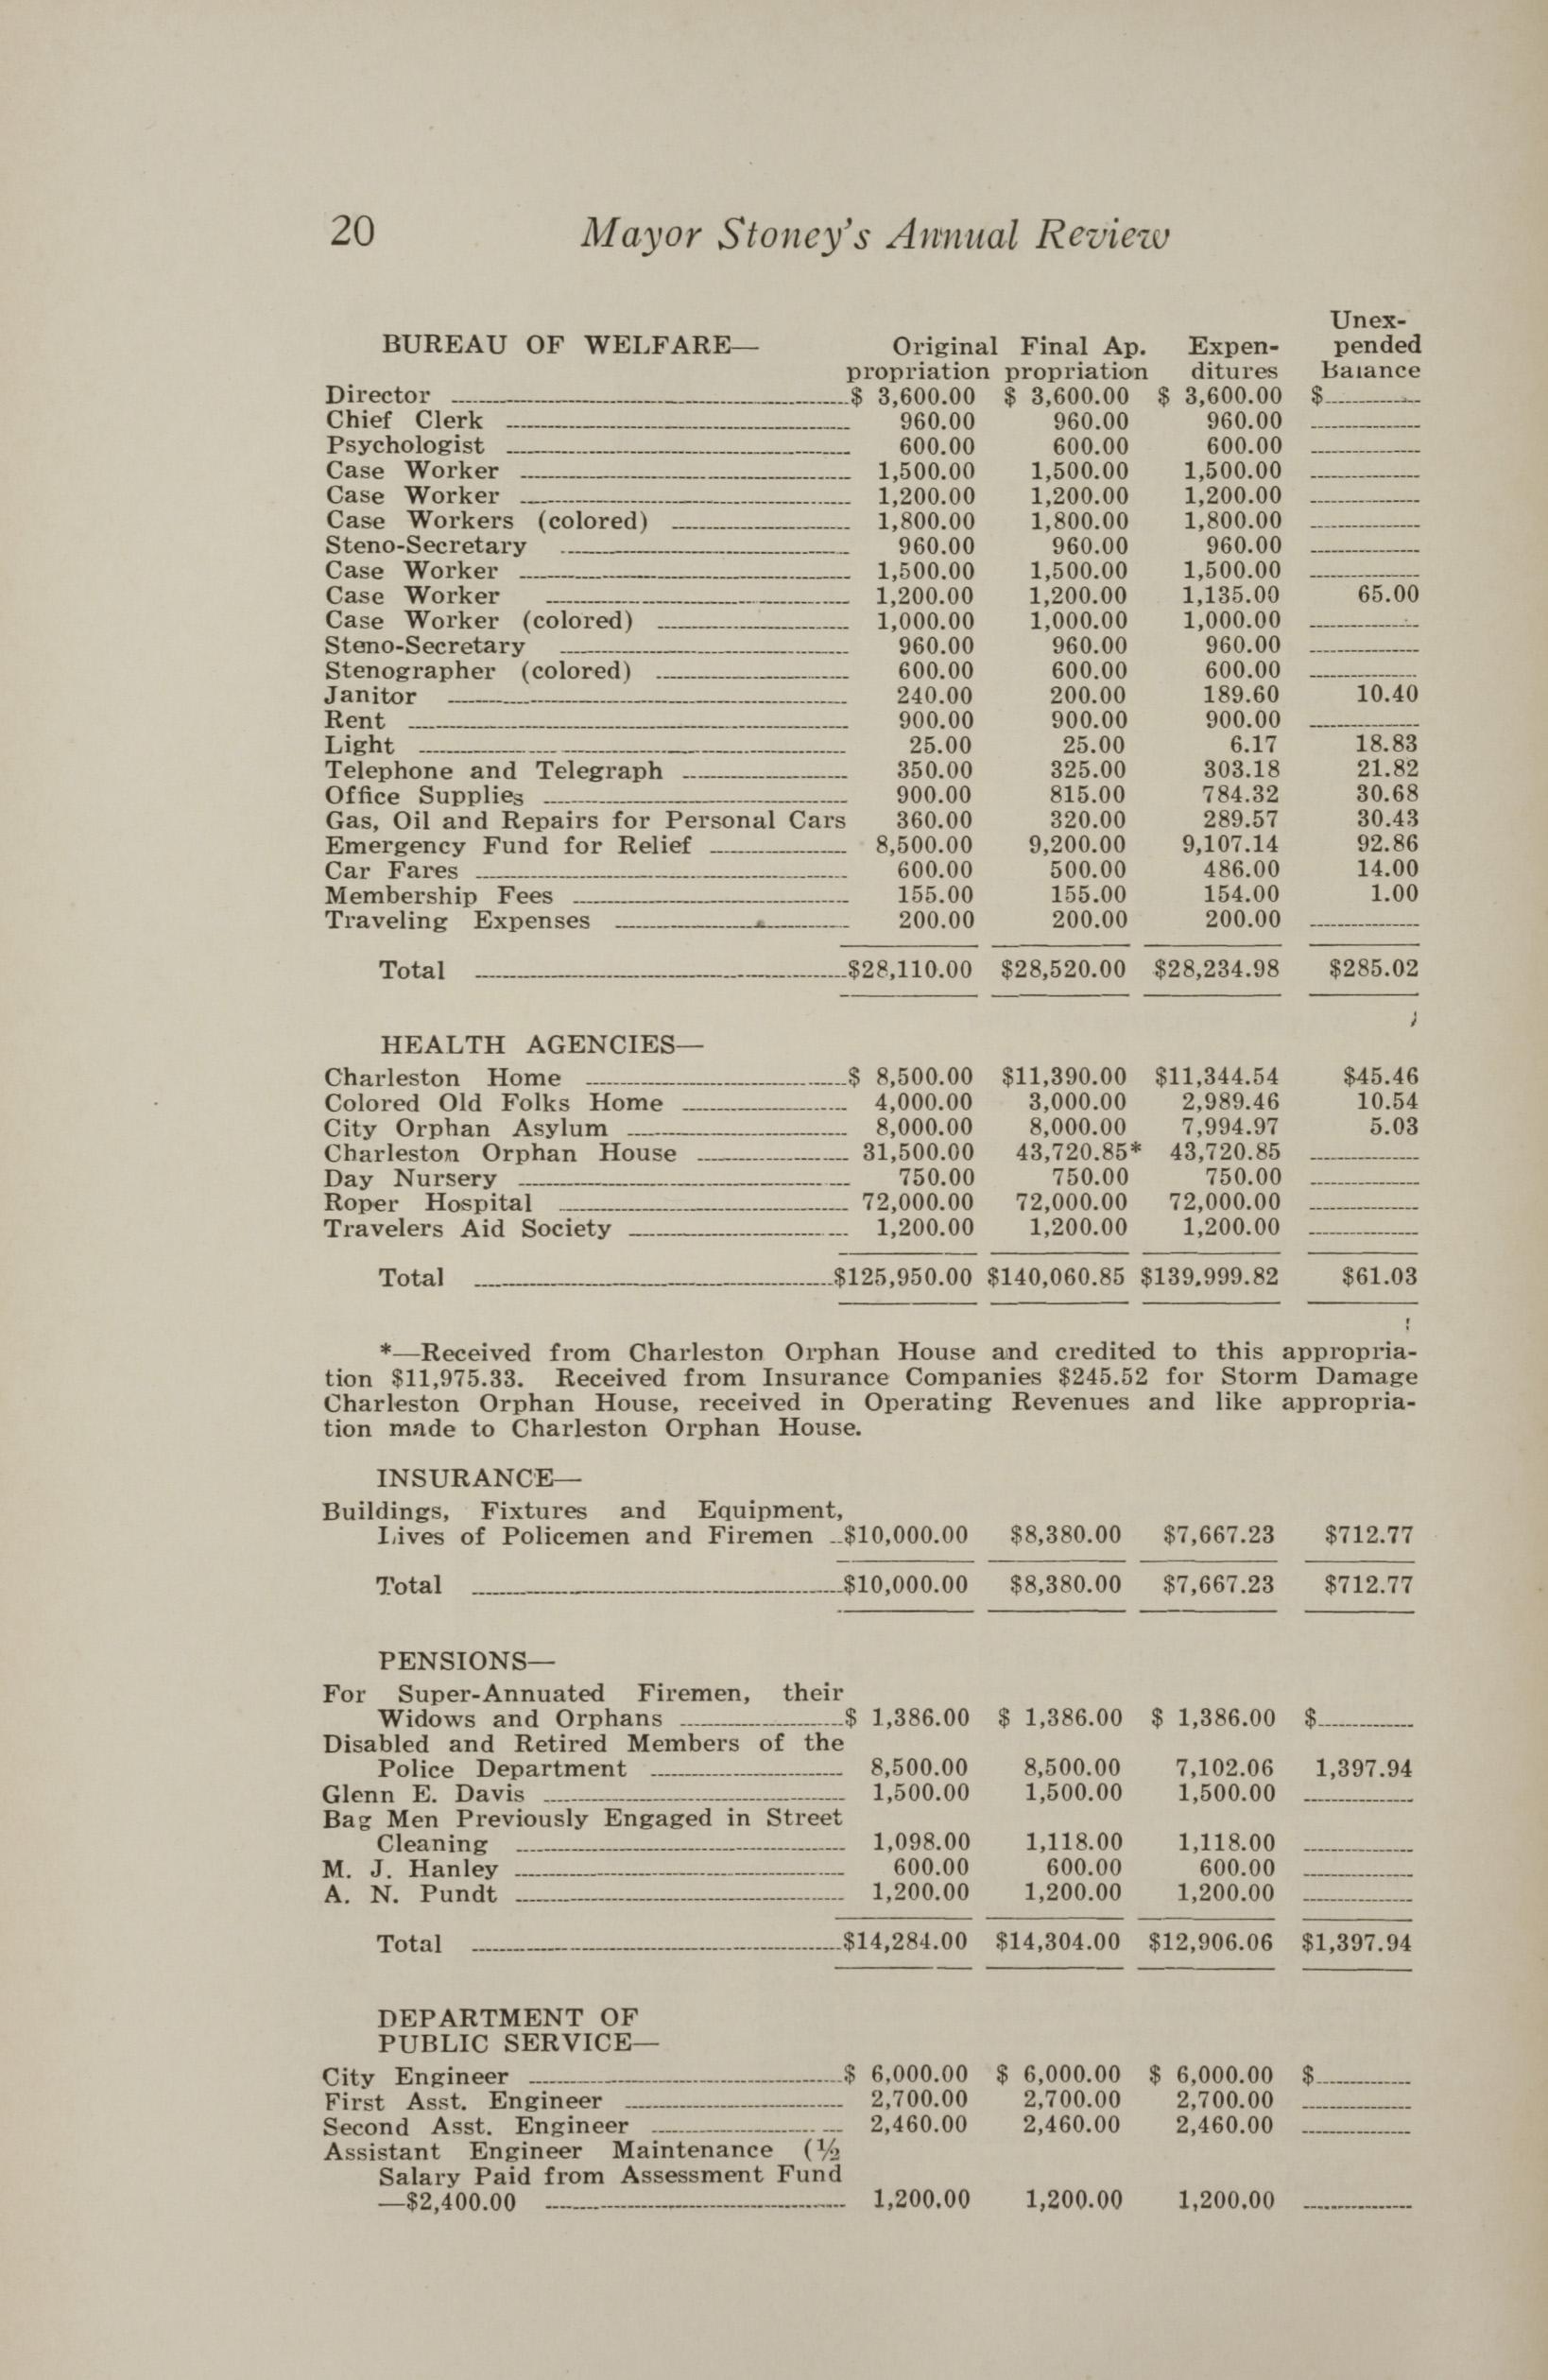 Charleston Yearbook, 1928, page 20